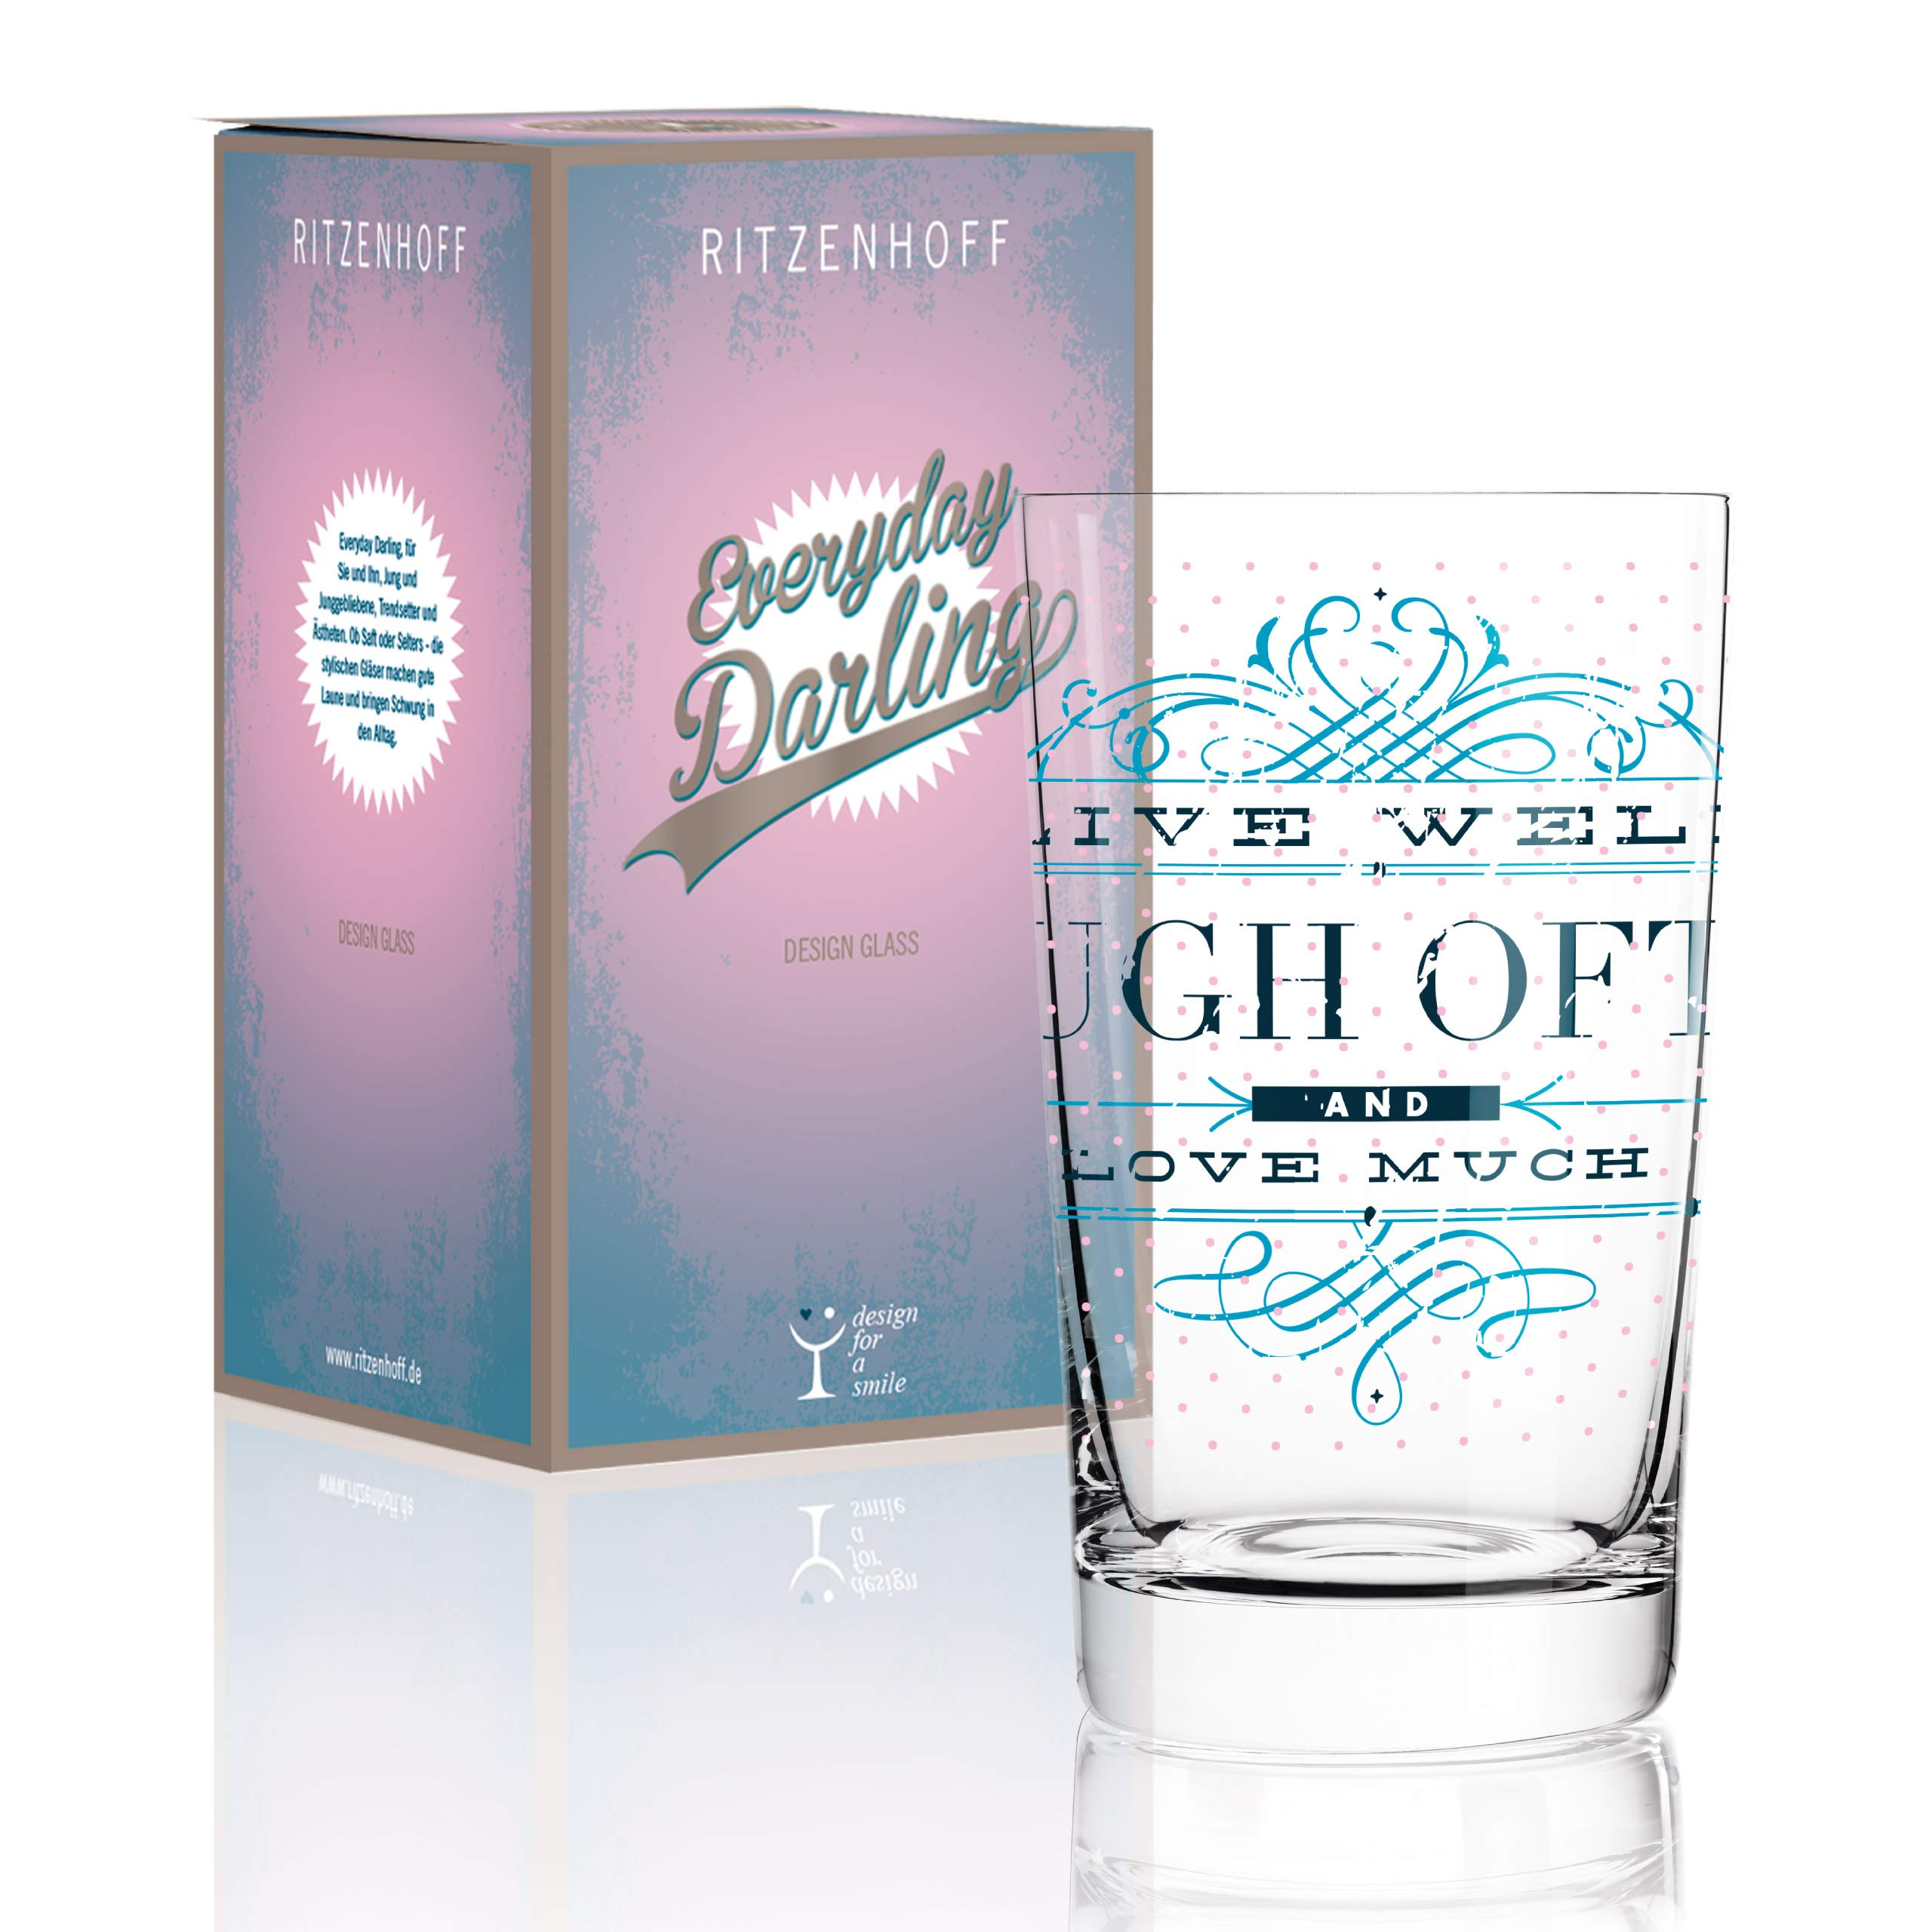 RITZENHOFF 0.3 Litre''Burkhard Neie Laugh often'' Everyday Darling Soft Drink Glass